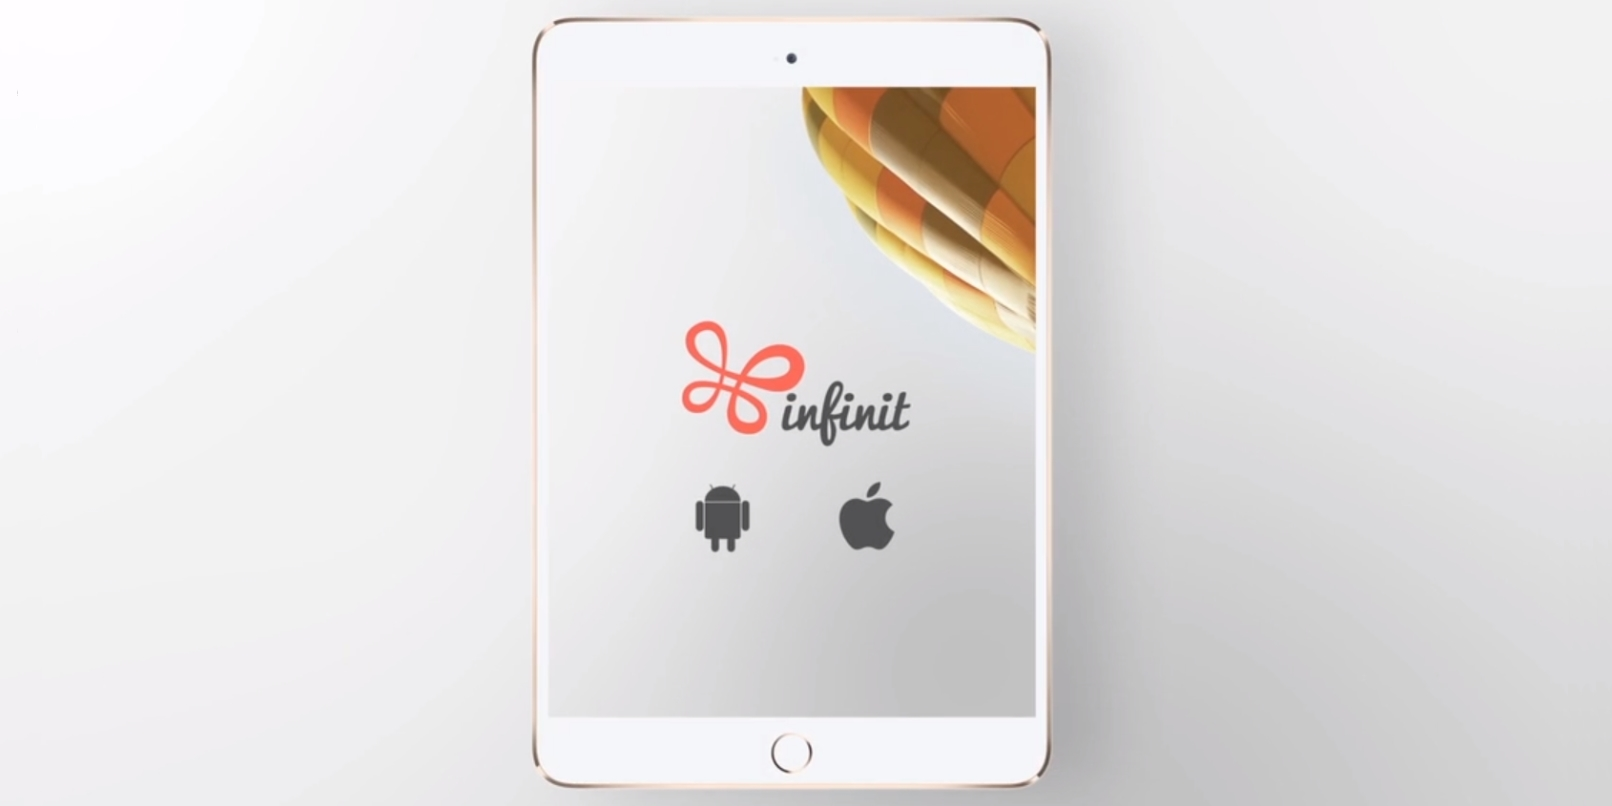 Infinit's cross-platform file sharing app arrives on iPad